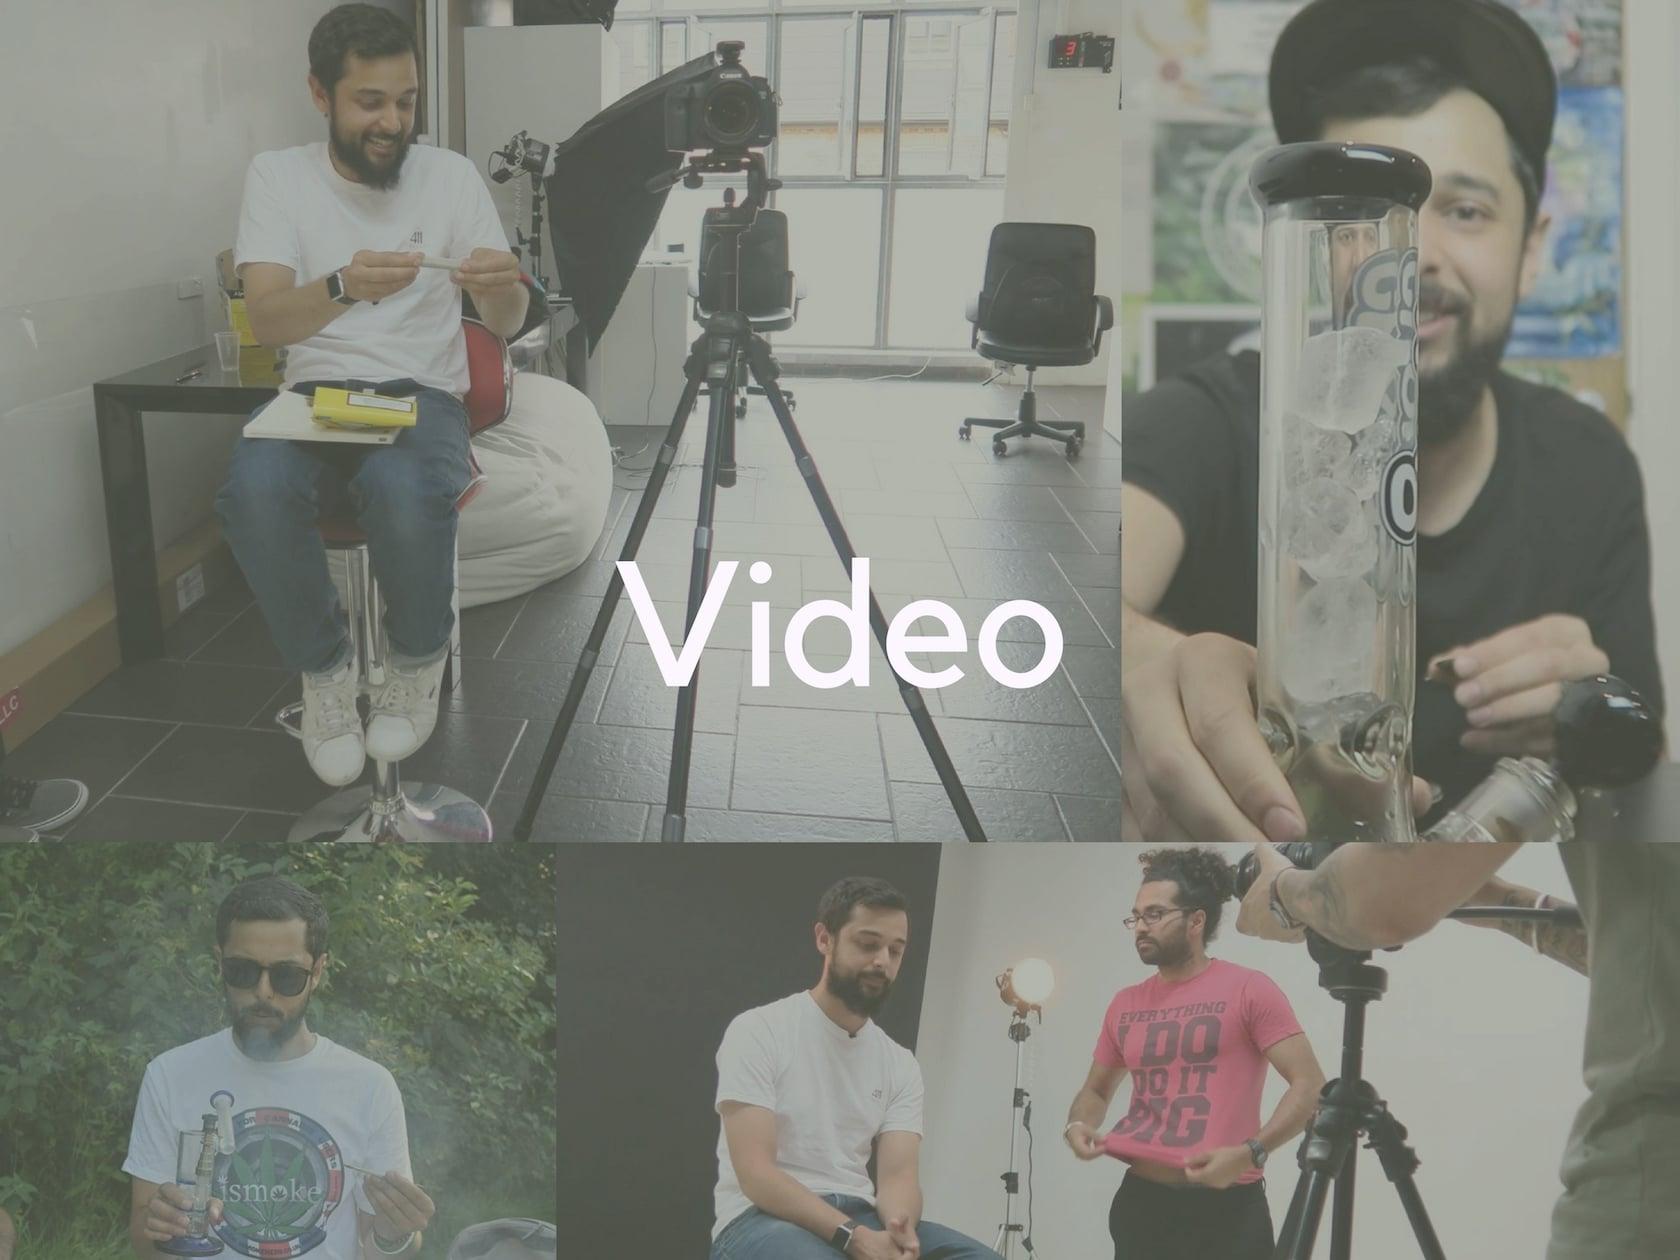 Video - ISMOKE